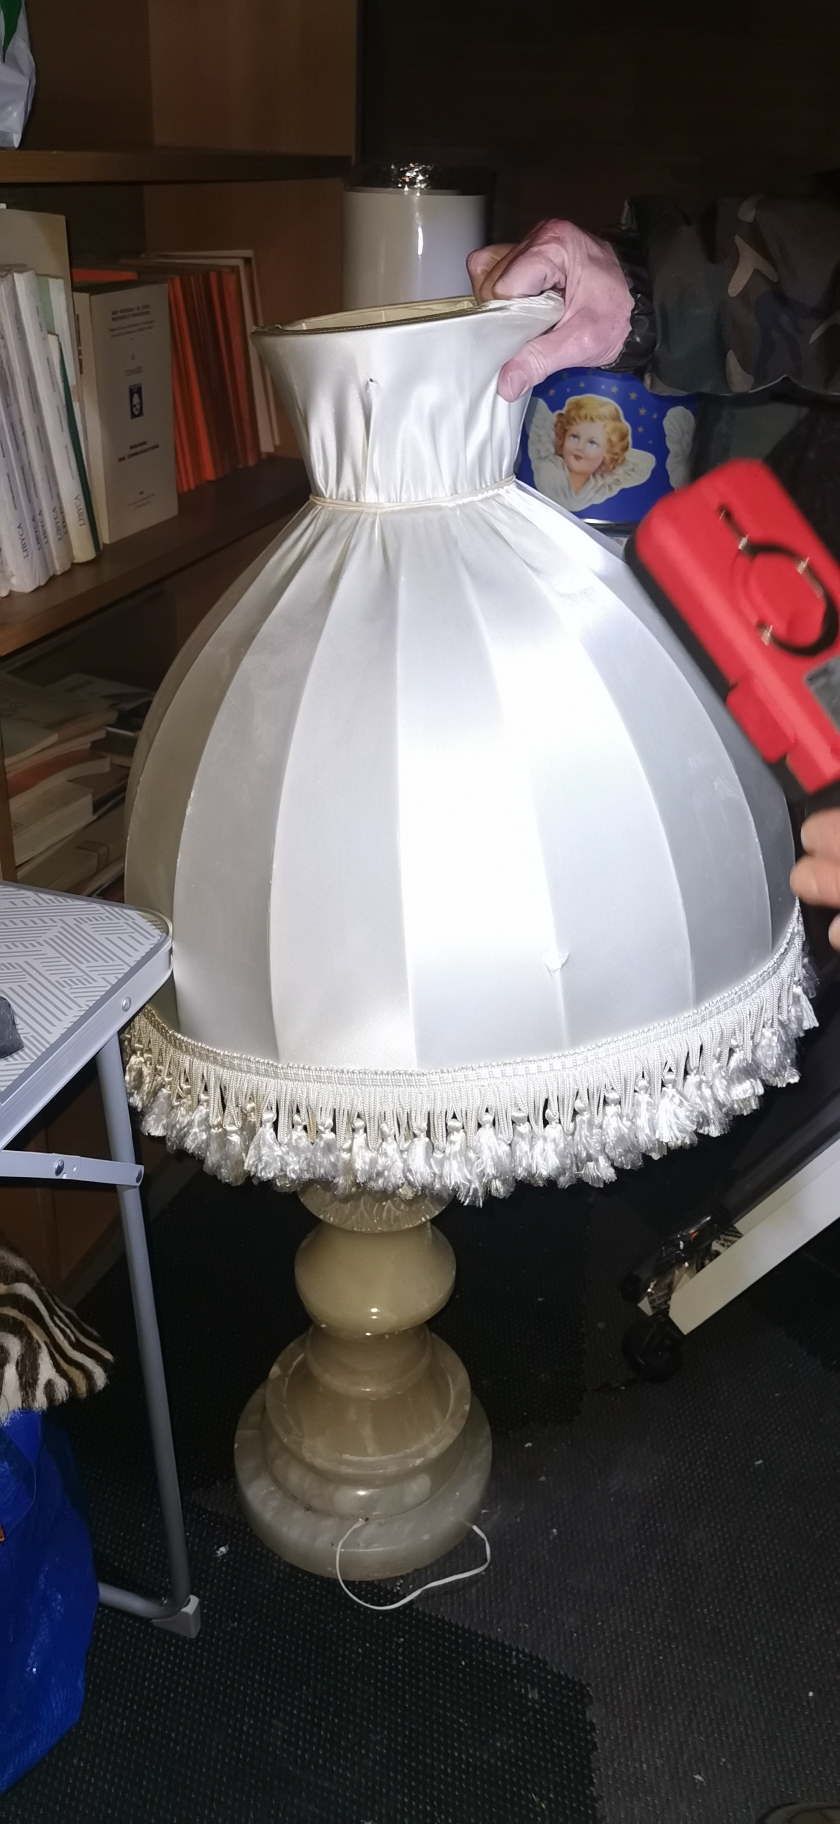 pied de lampe albatre ?  Img_2071